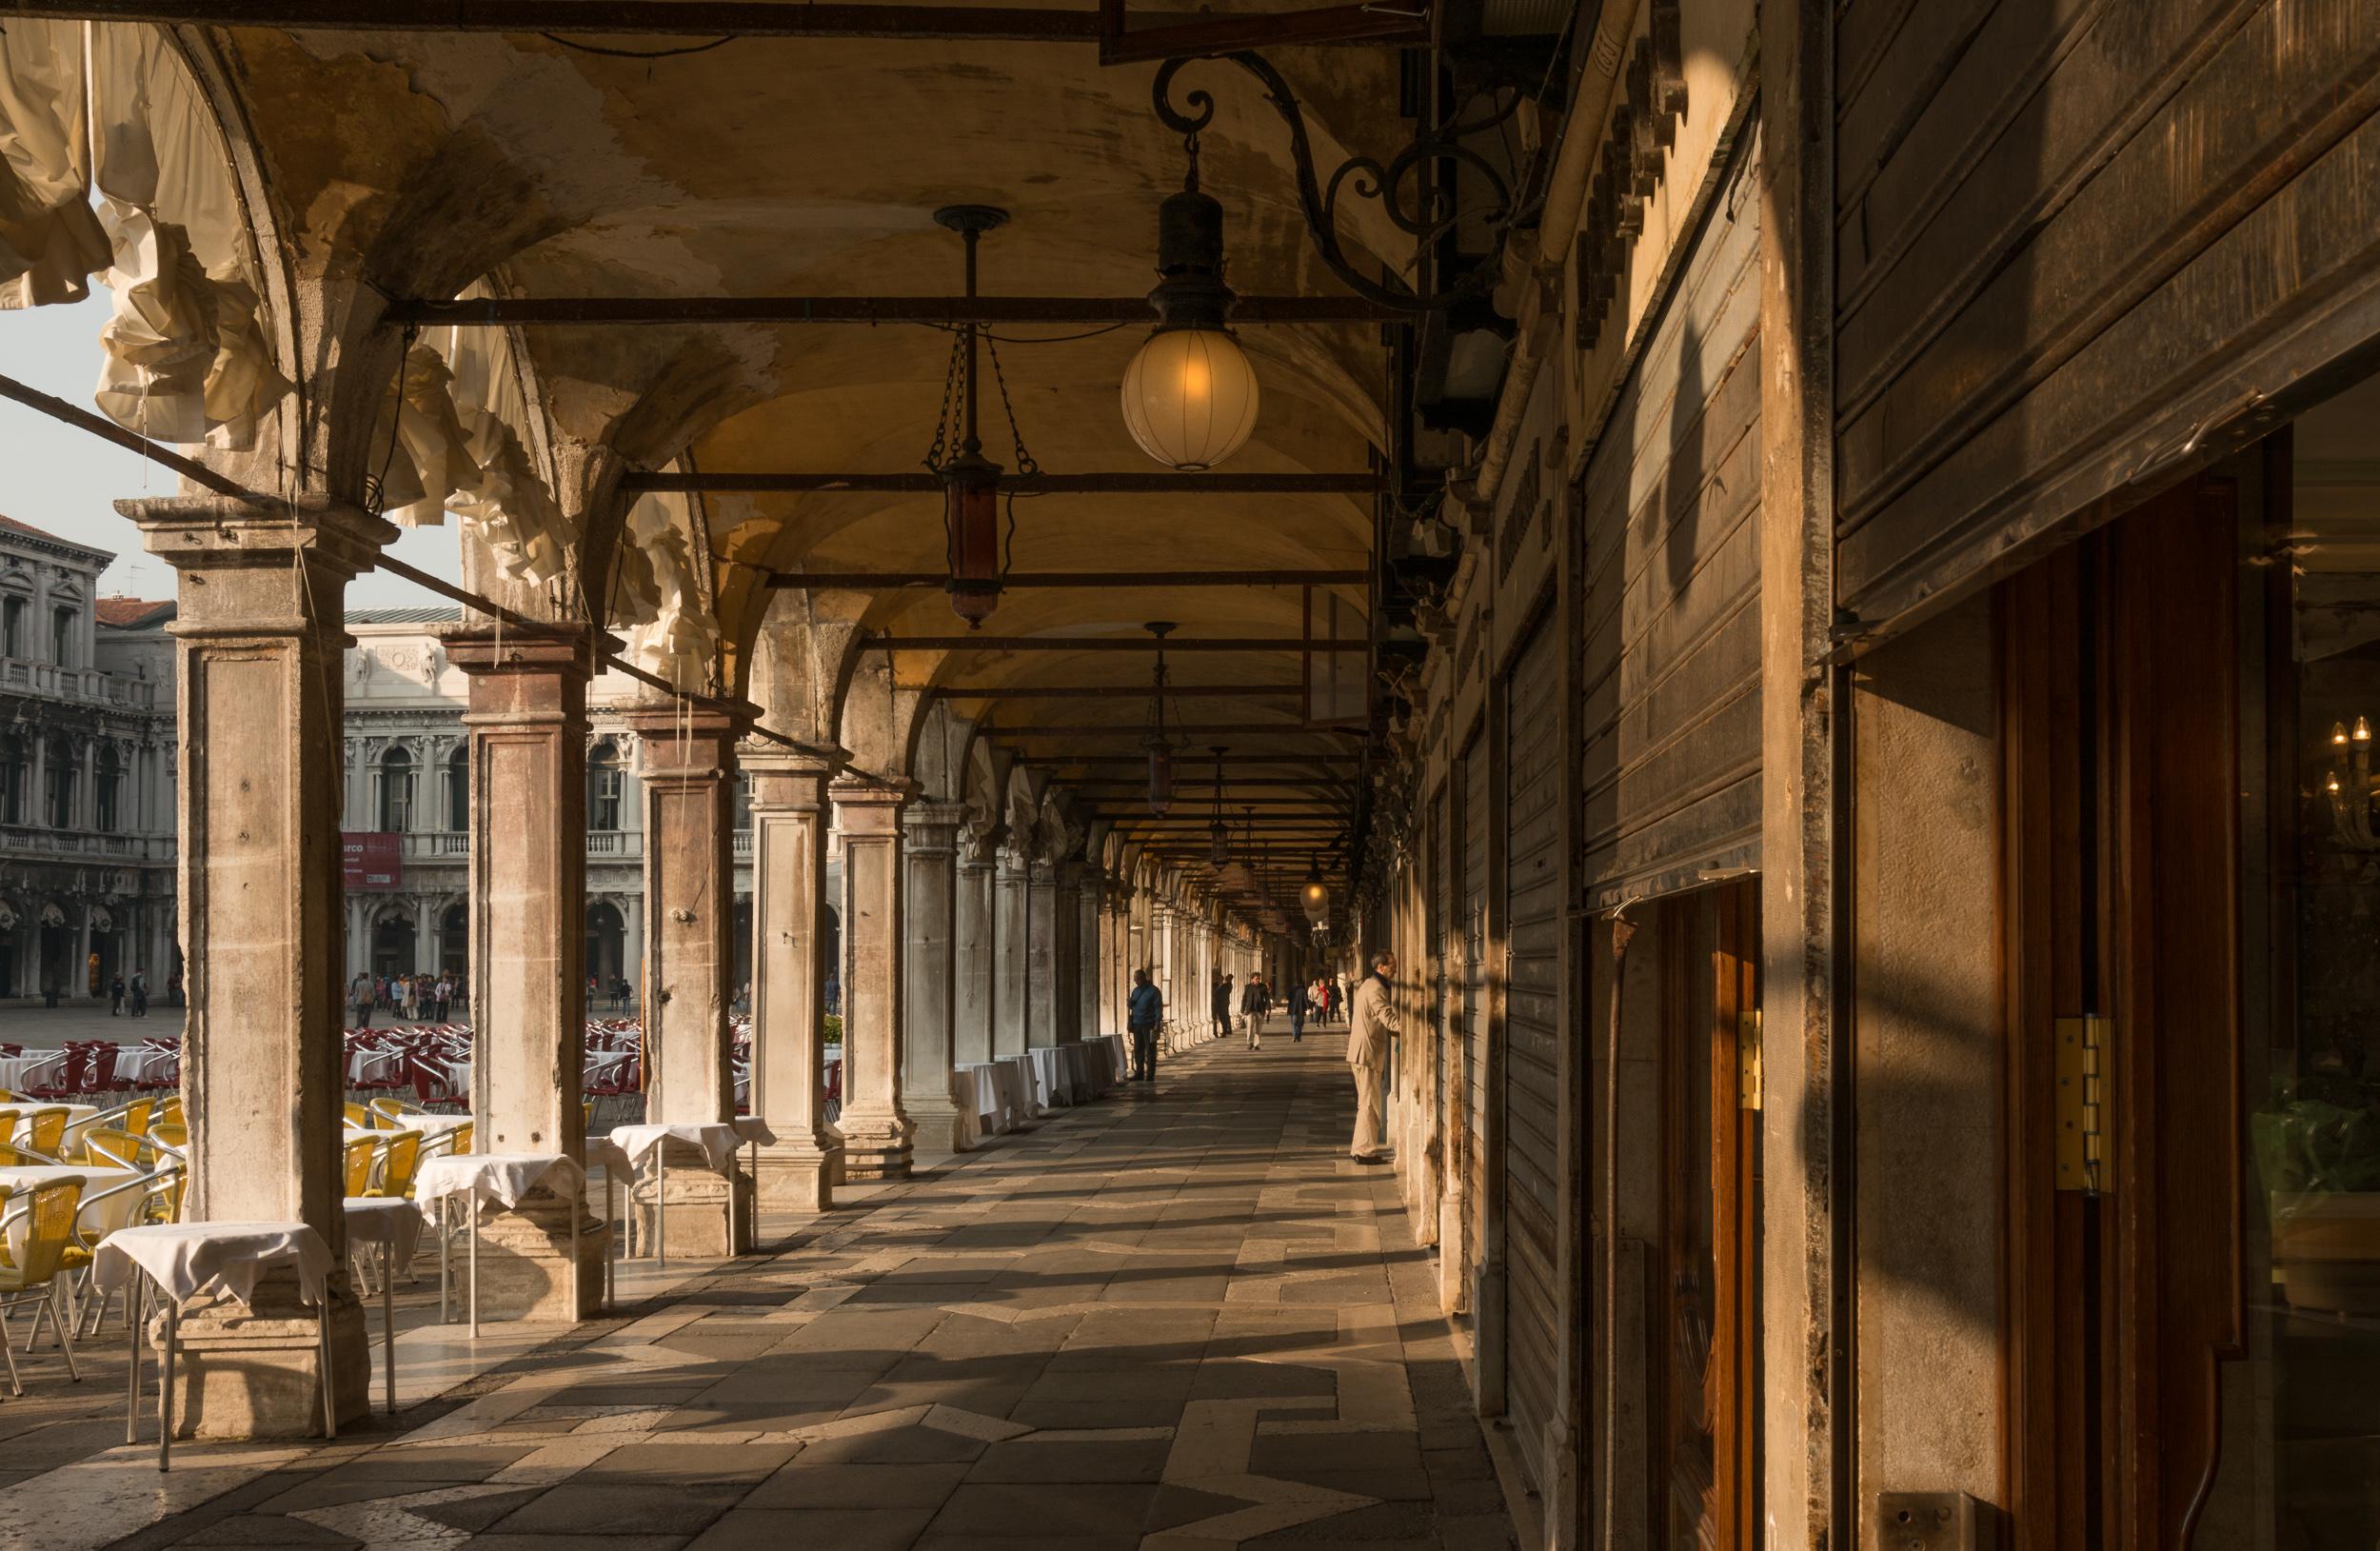 Plaza San Marco, Venice